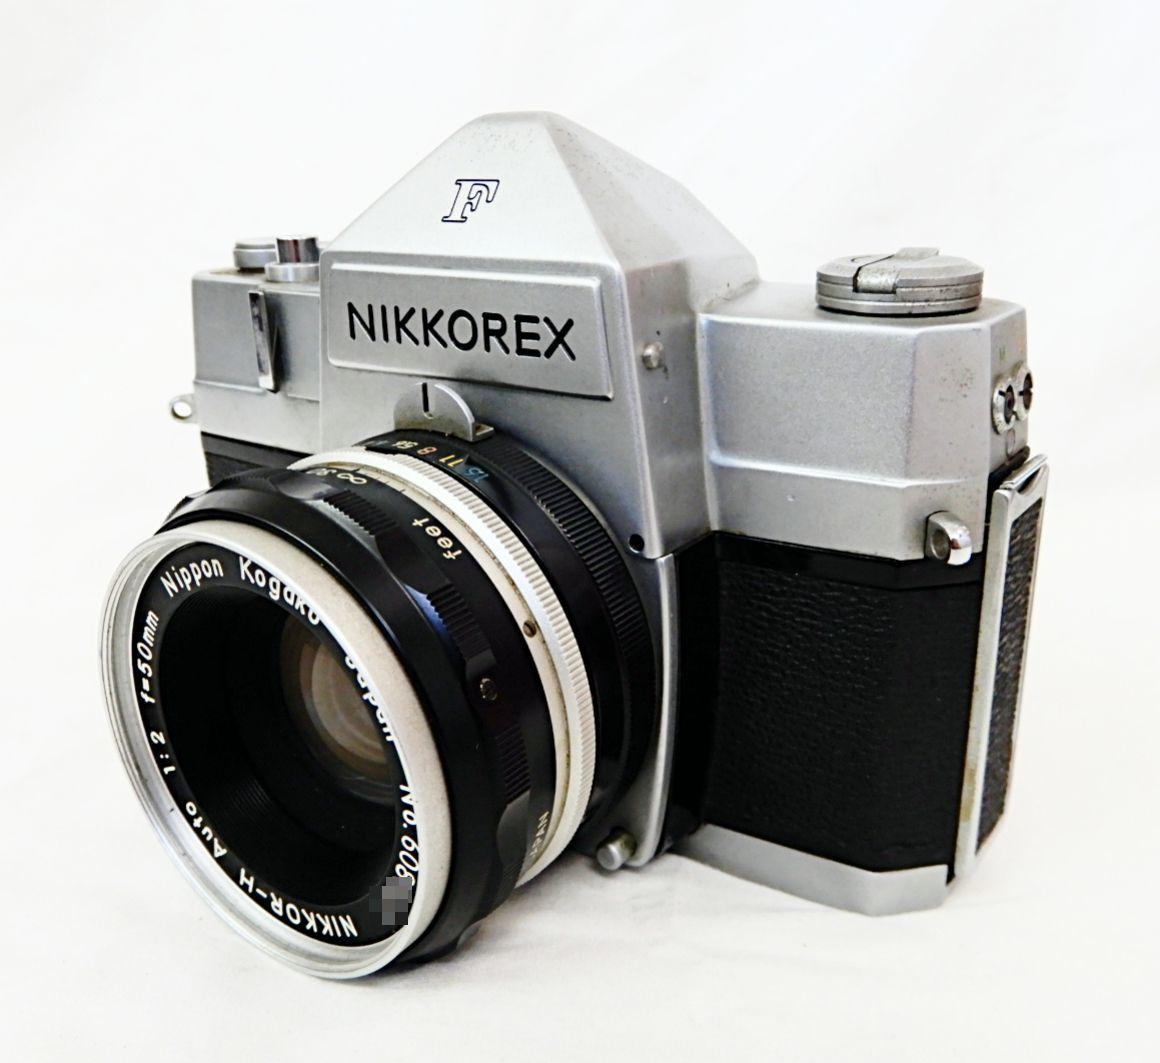 【JUNK品★1円~】 ニコン / Nikon NIKKOREX F 露出計 付 + NIKKOR-H Auto 1:2 f=50mm_画像2